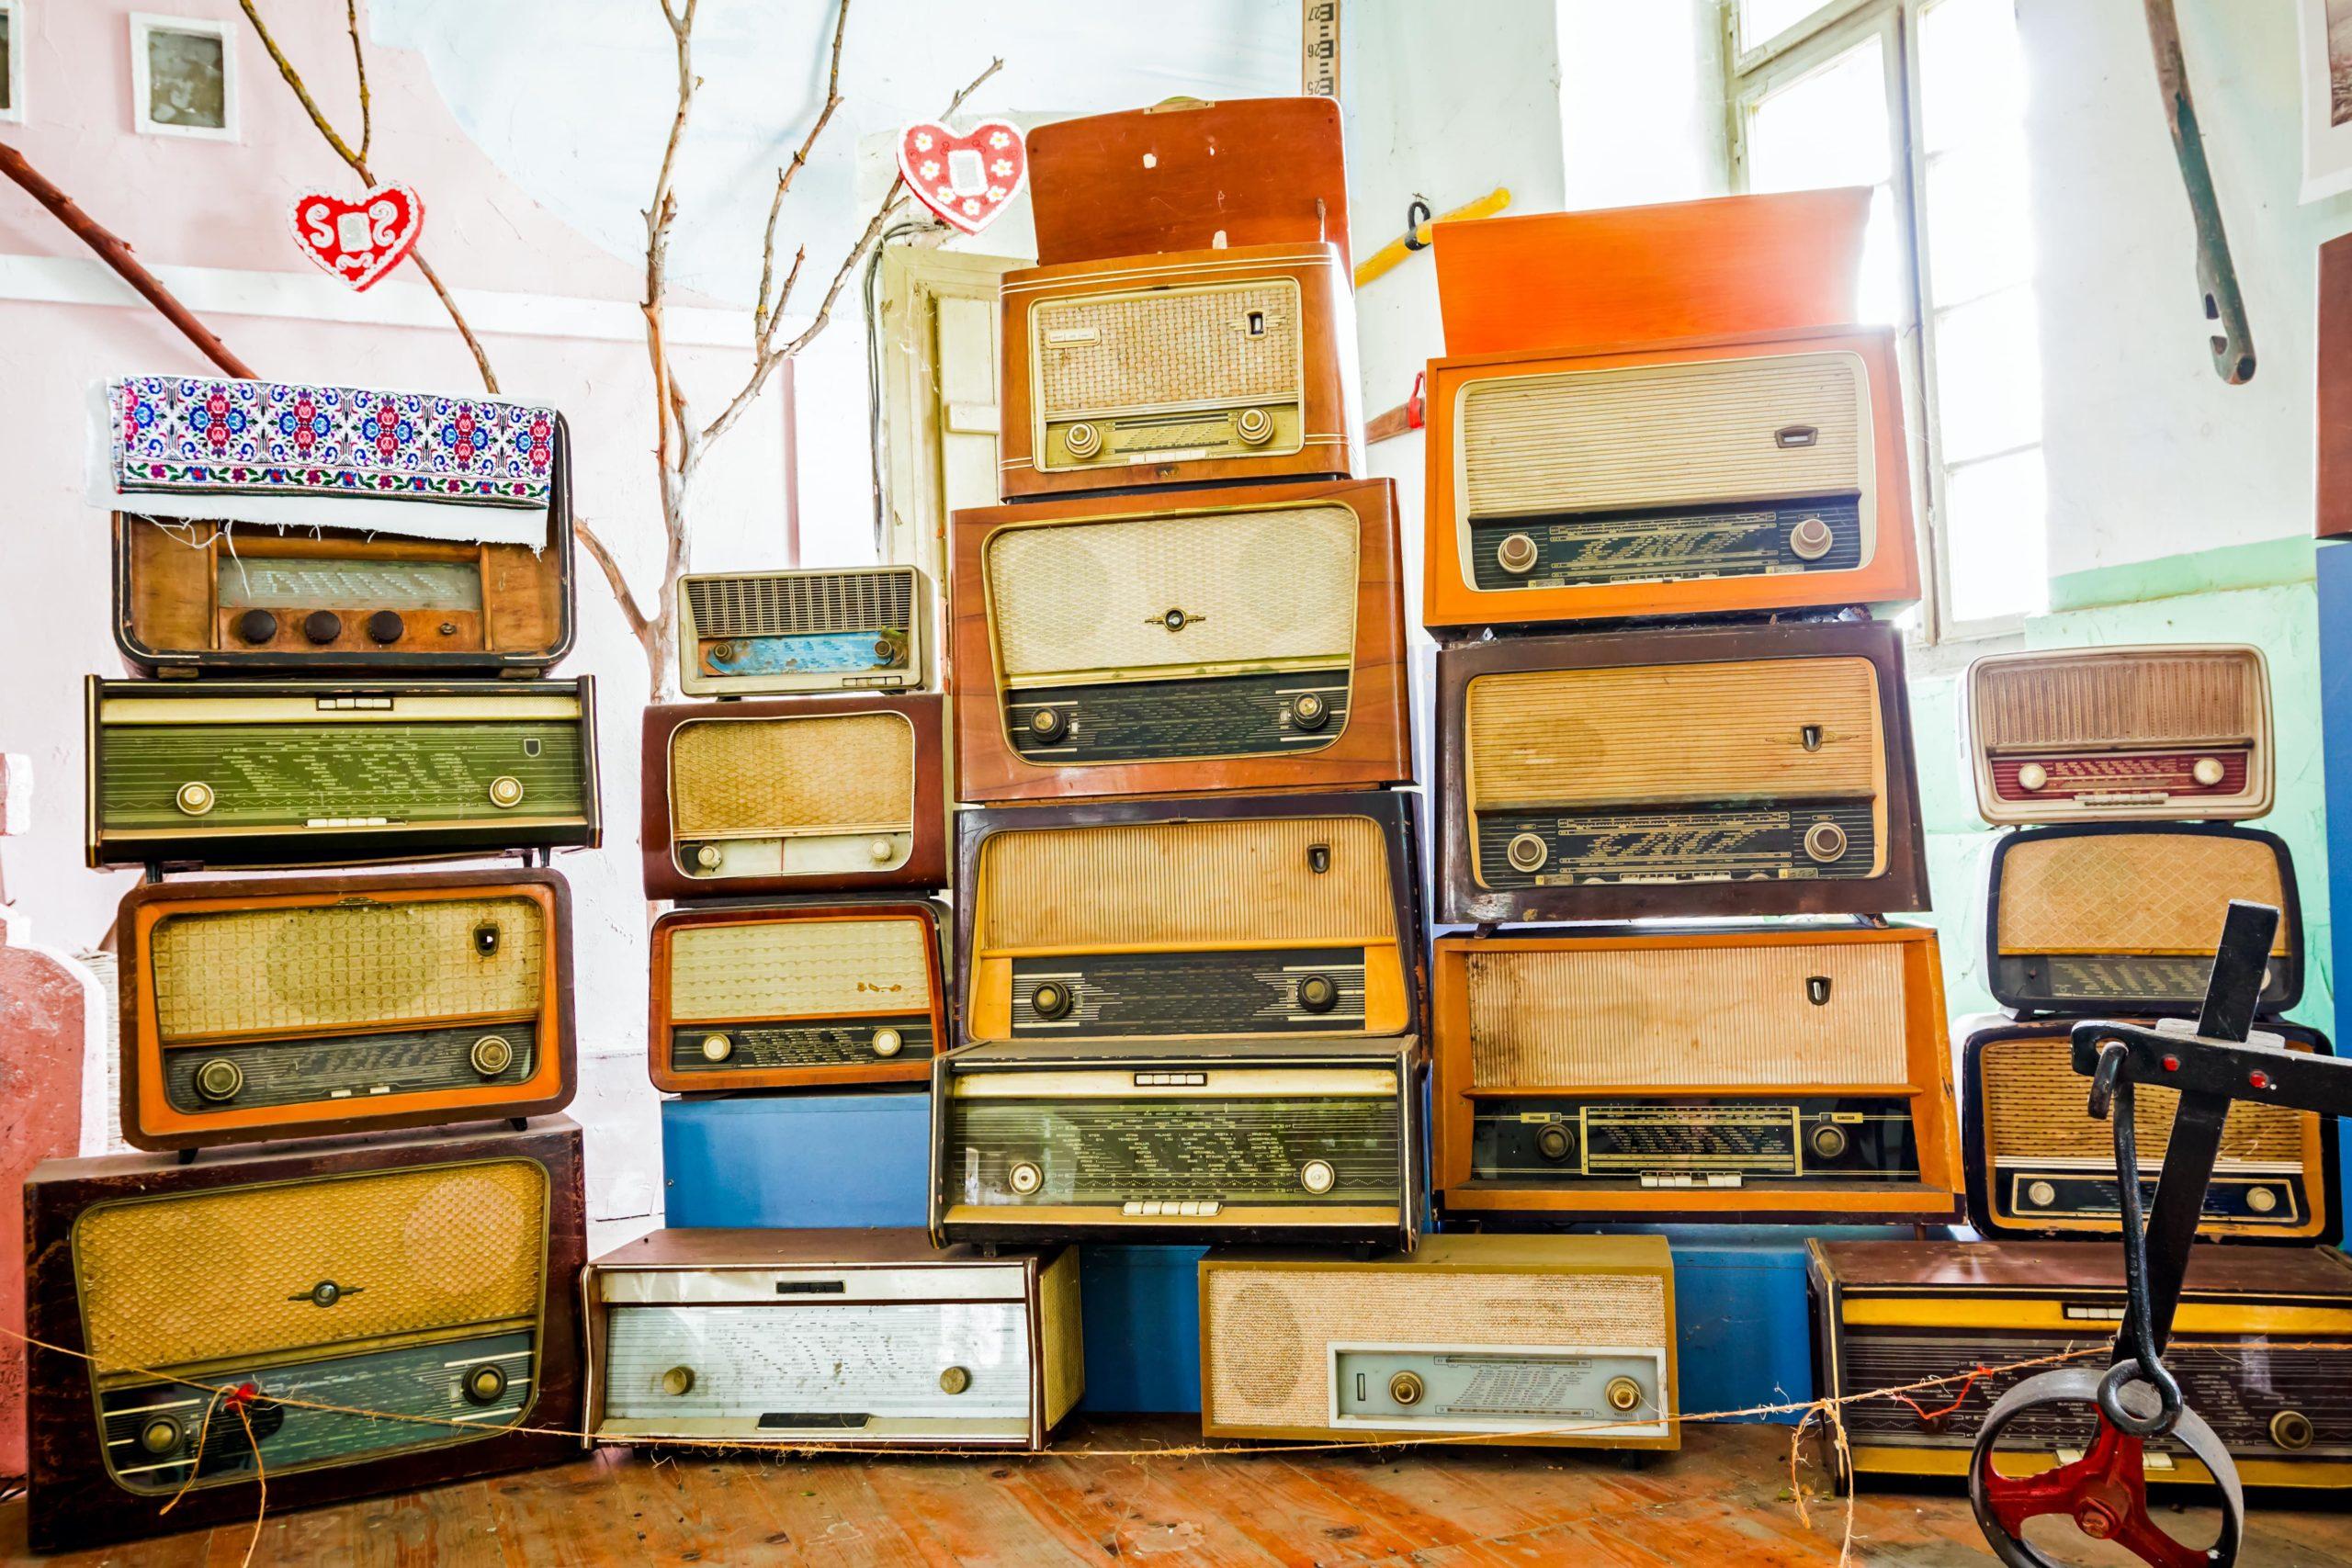 Verschiedene Radios